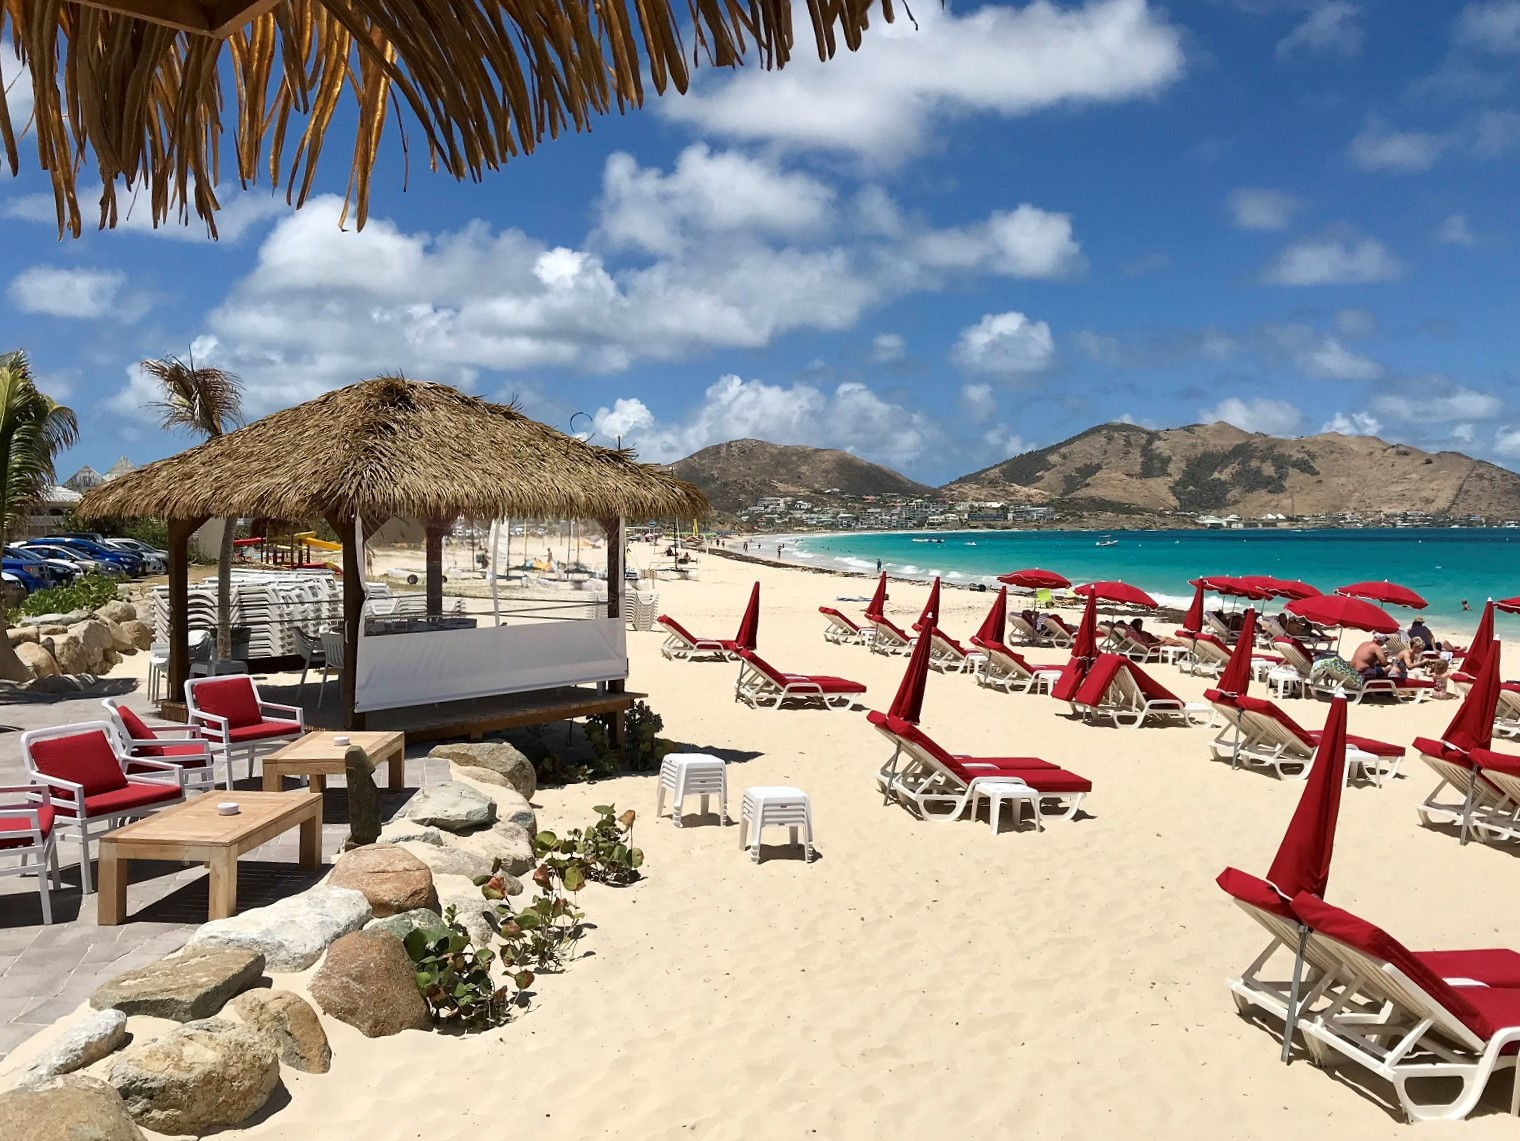 ocean beach with red umbrellas - retirement travel tips